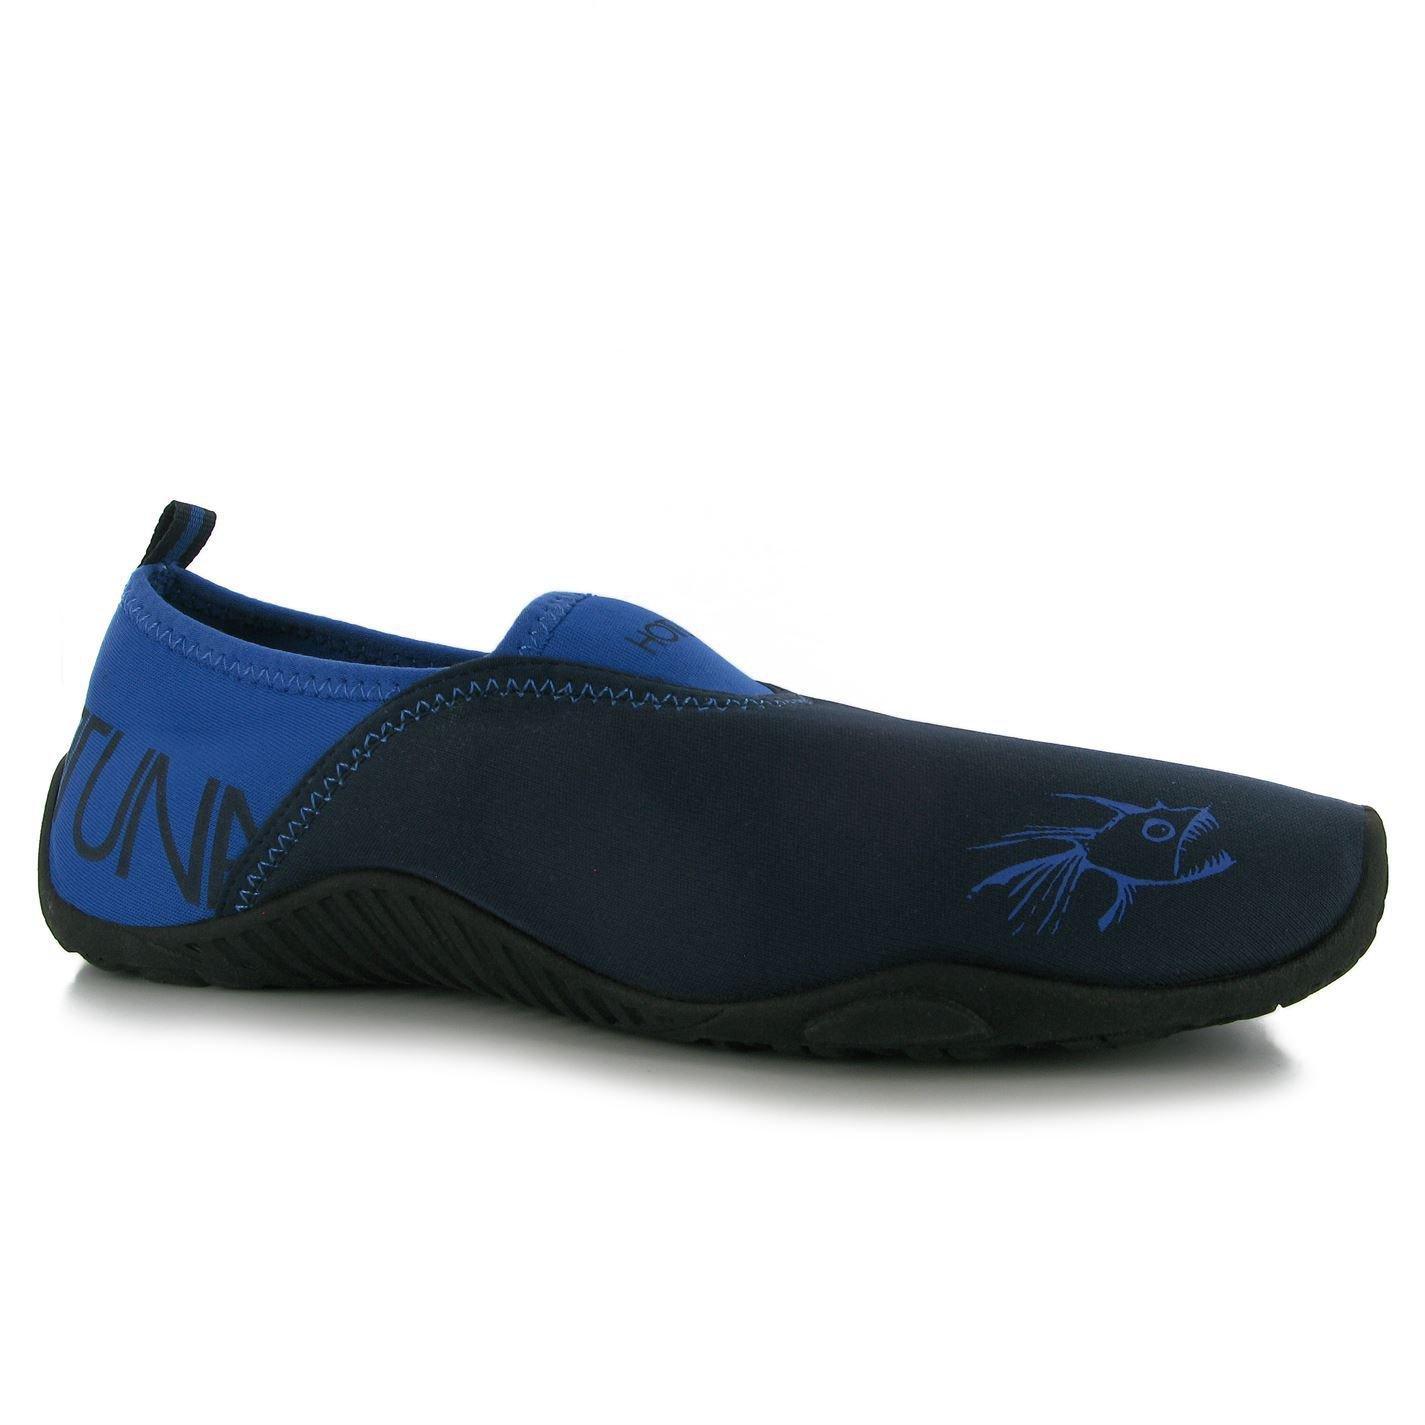 Hot Tuna Mens Splasher Shoes Pool Water Slip On Rubber Sole Swim Beach Sandal